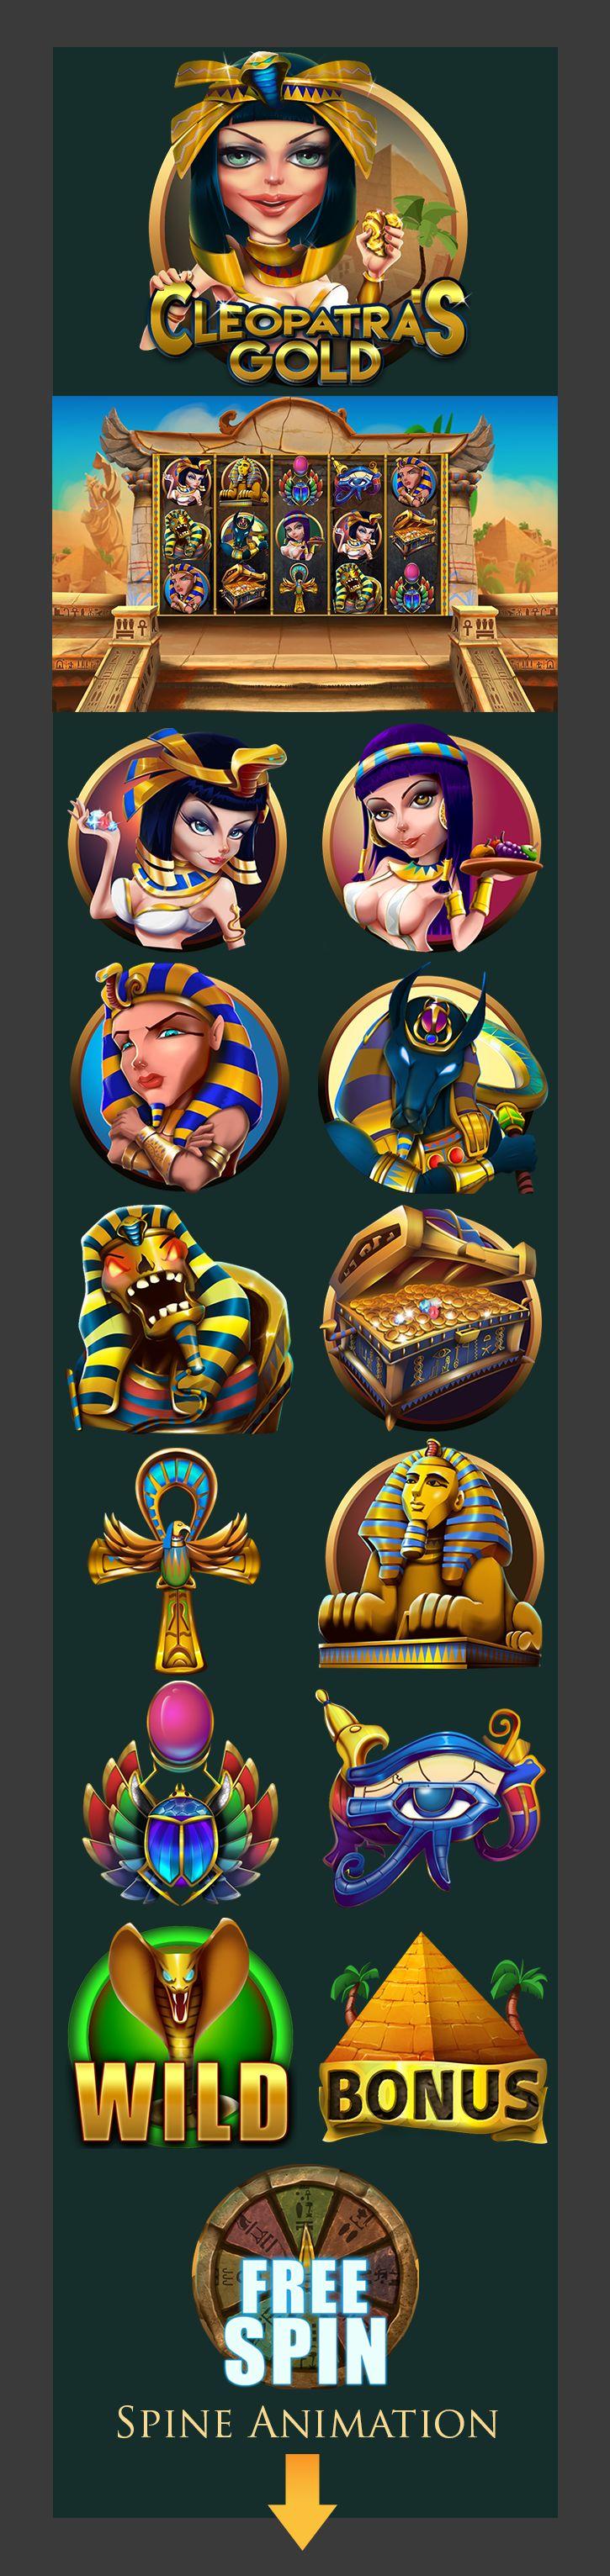 https://www.behance.net/gallery/36651453/Casino_Slot-machine_Mobile-Game-Art-_CleopatrasGold